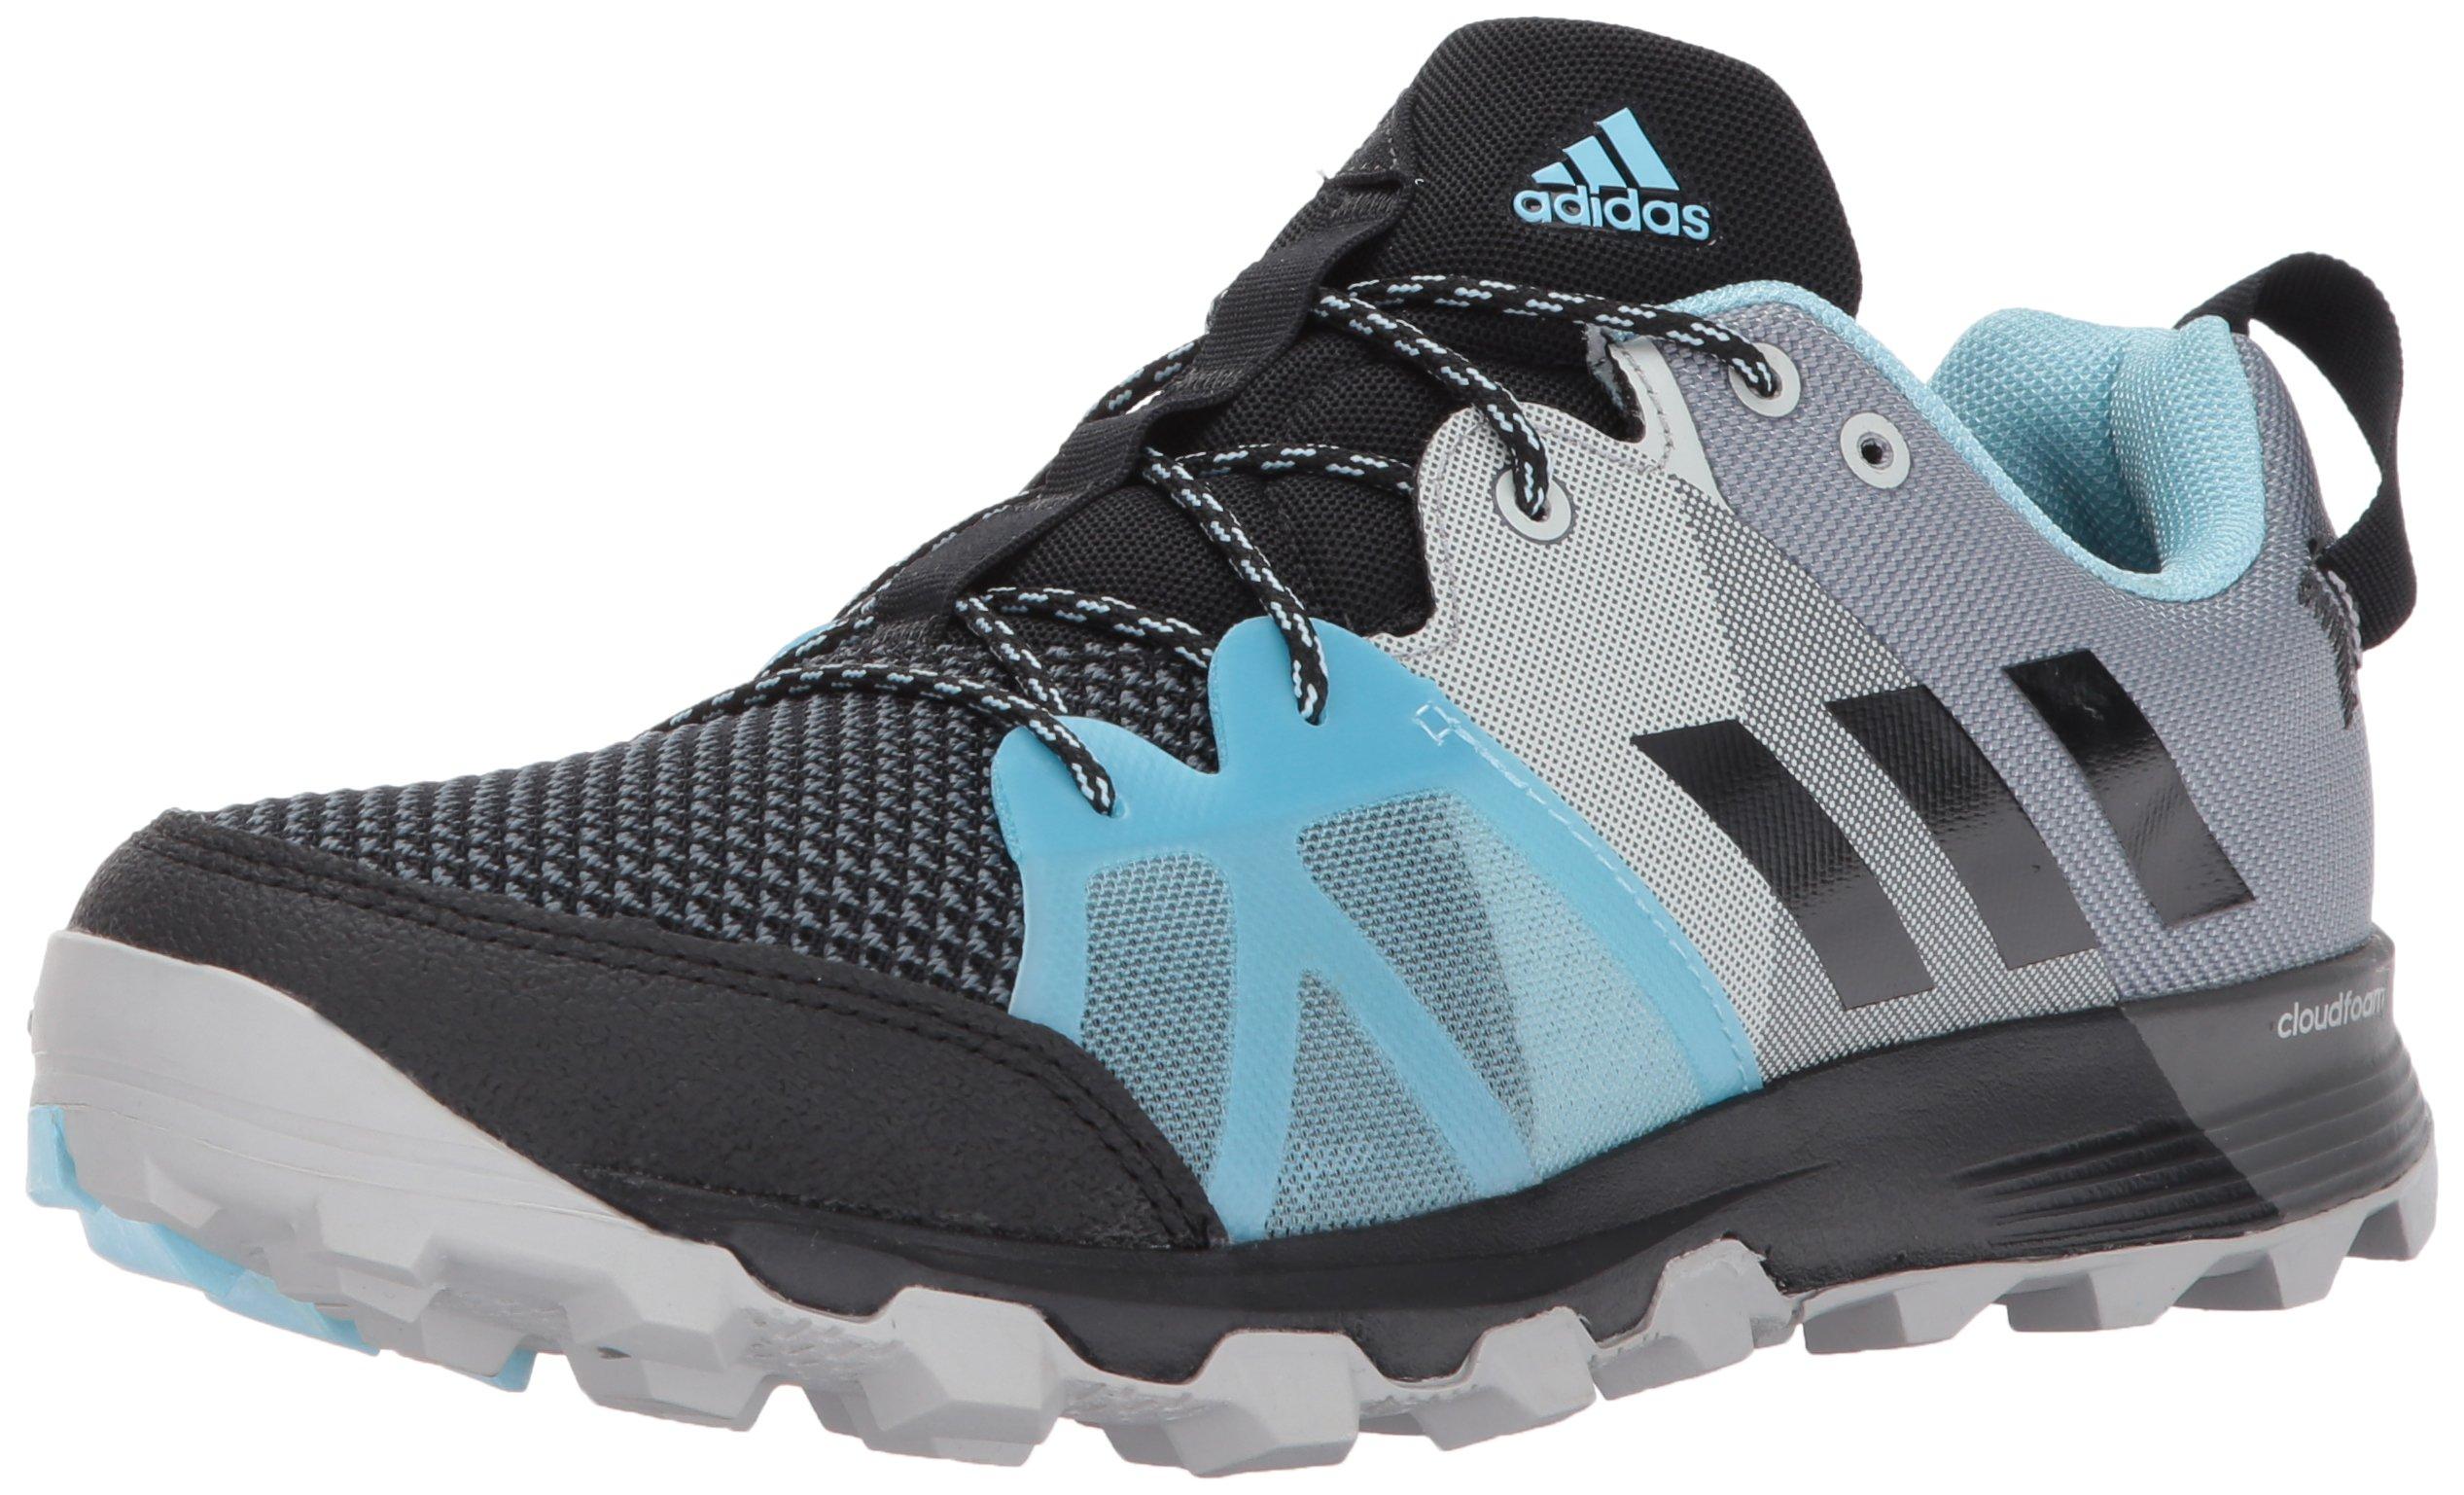 adidas outdoor Women's Kanadia 8.1 Trail W Running Shoe Black/Icey Blue, 10 M US